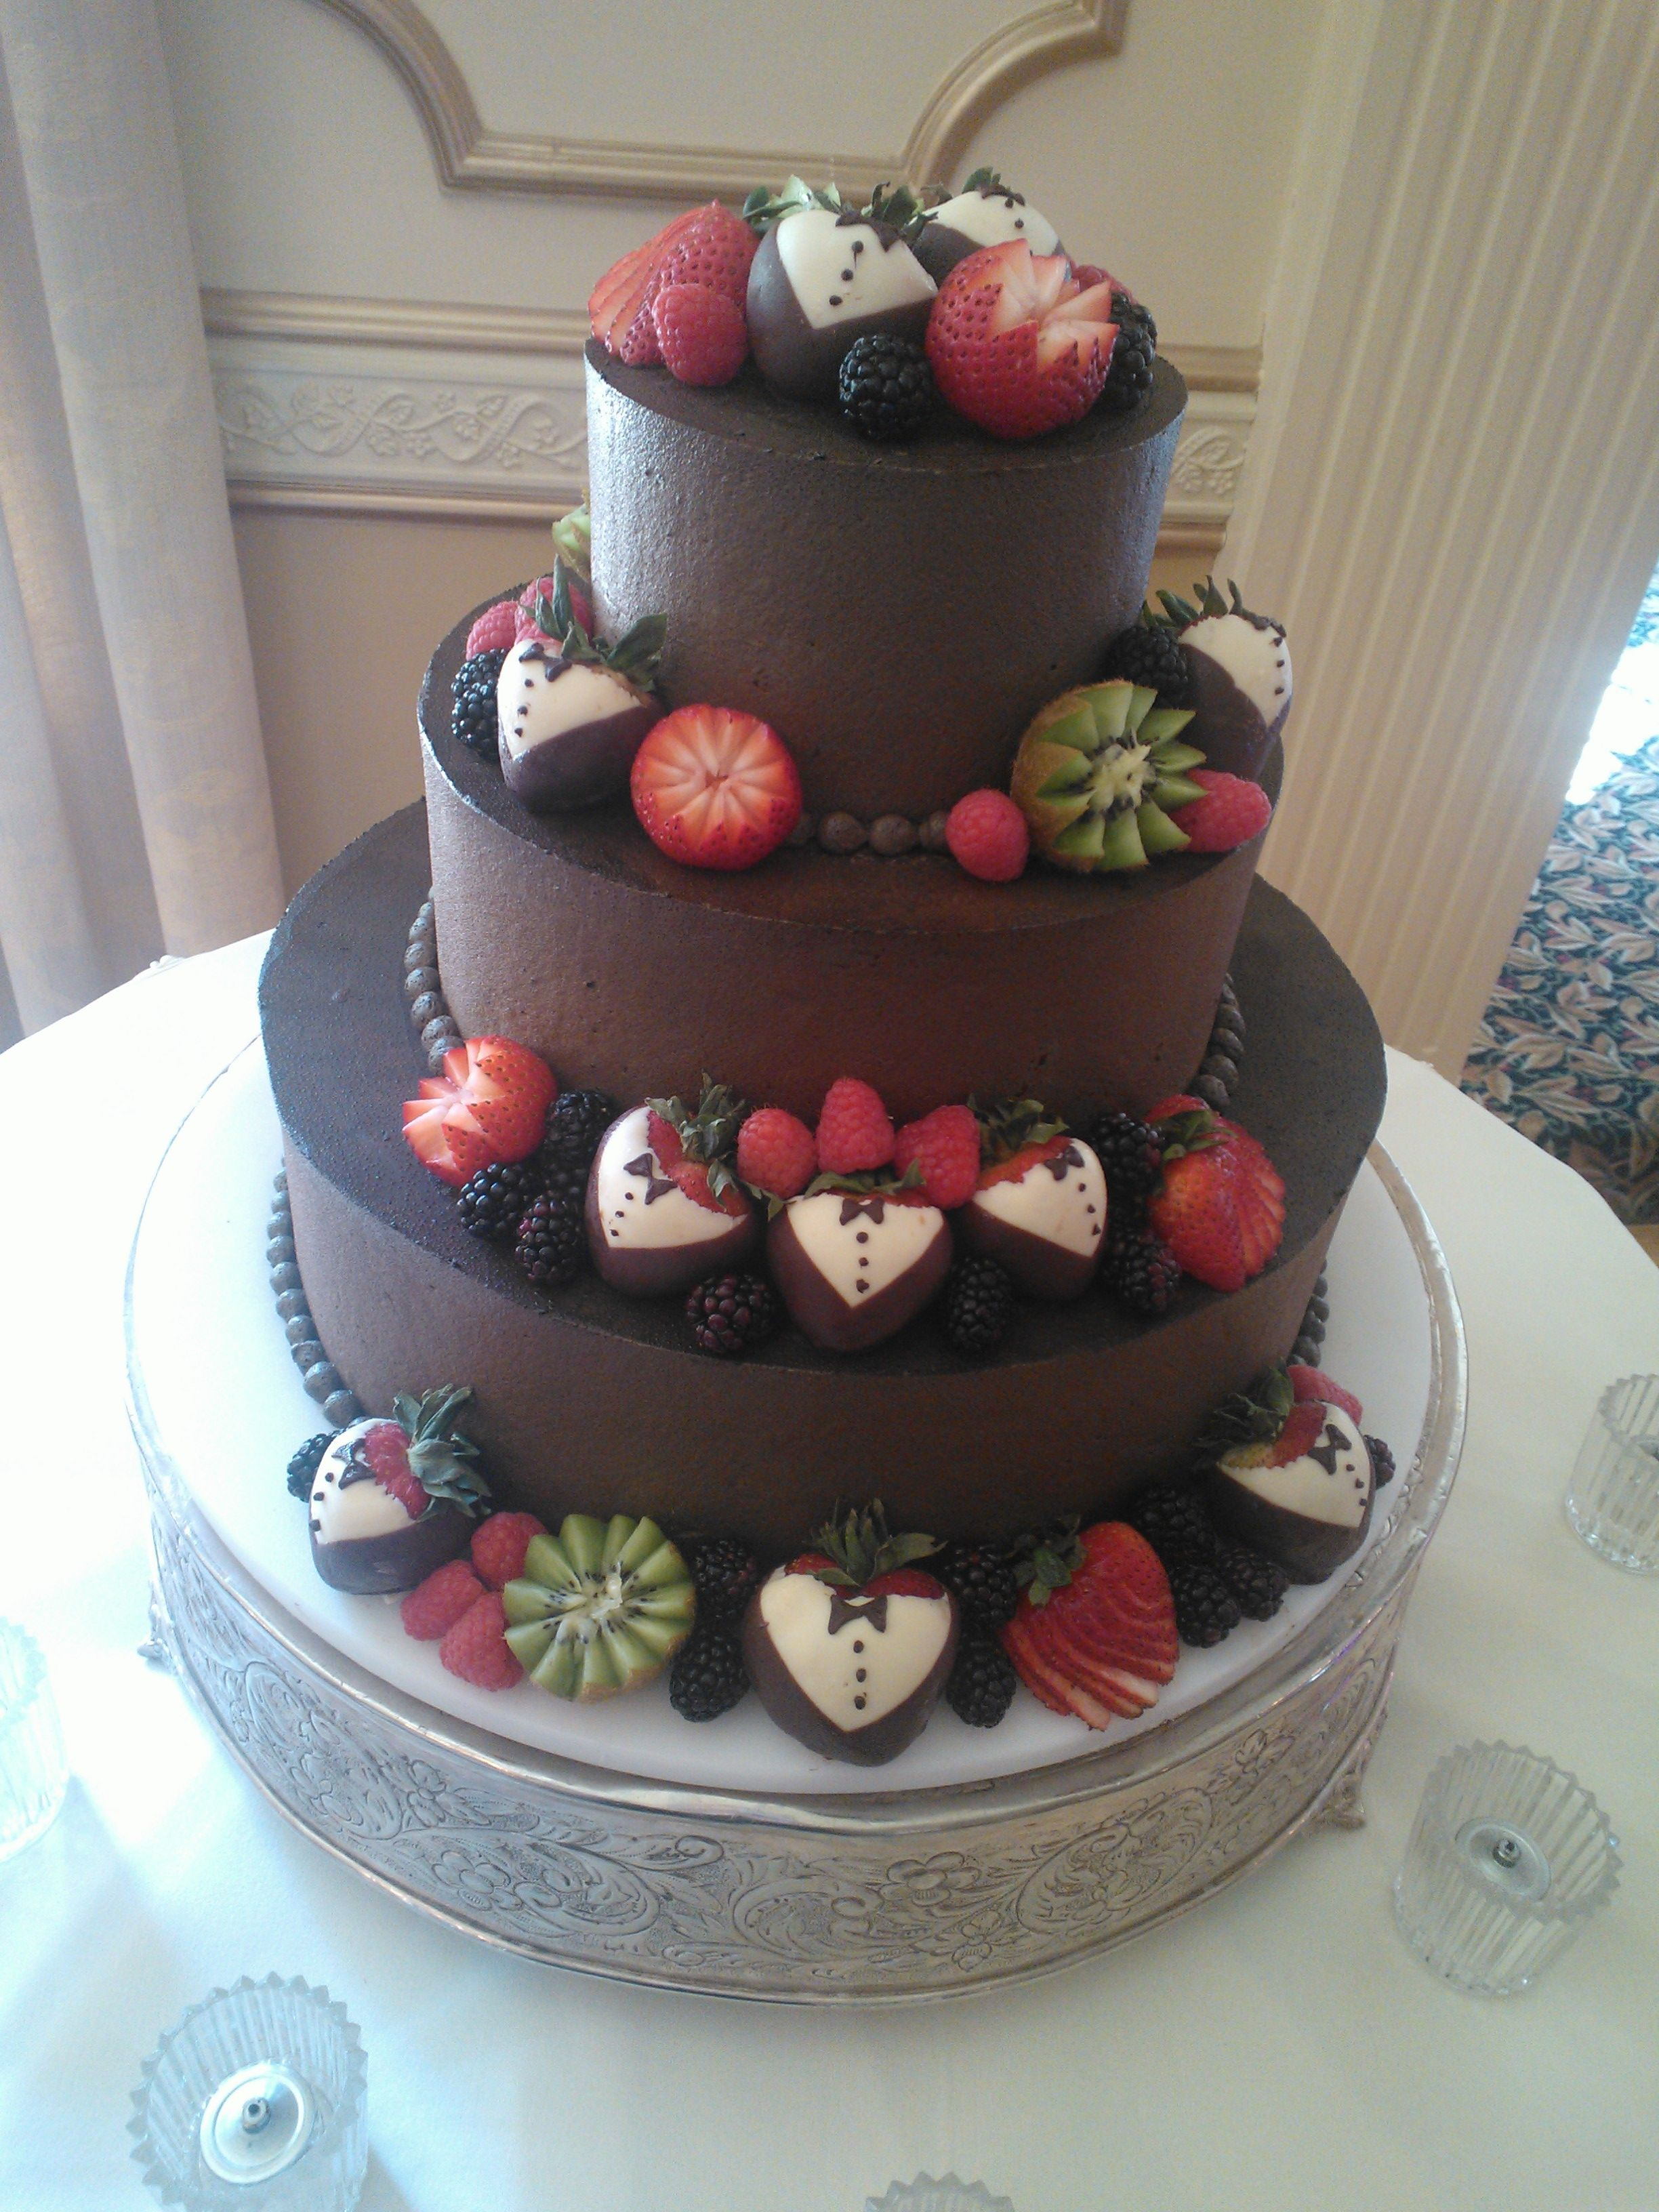 Cake Decorated With Fruits Pinterest : Wedding cake decorated with fruit Cake: with fruit ...